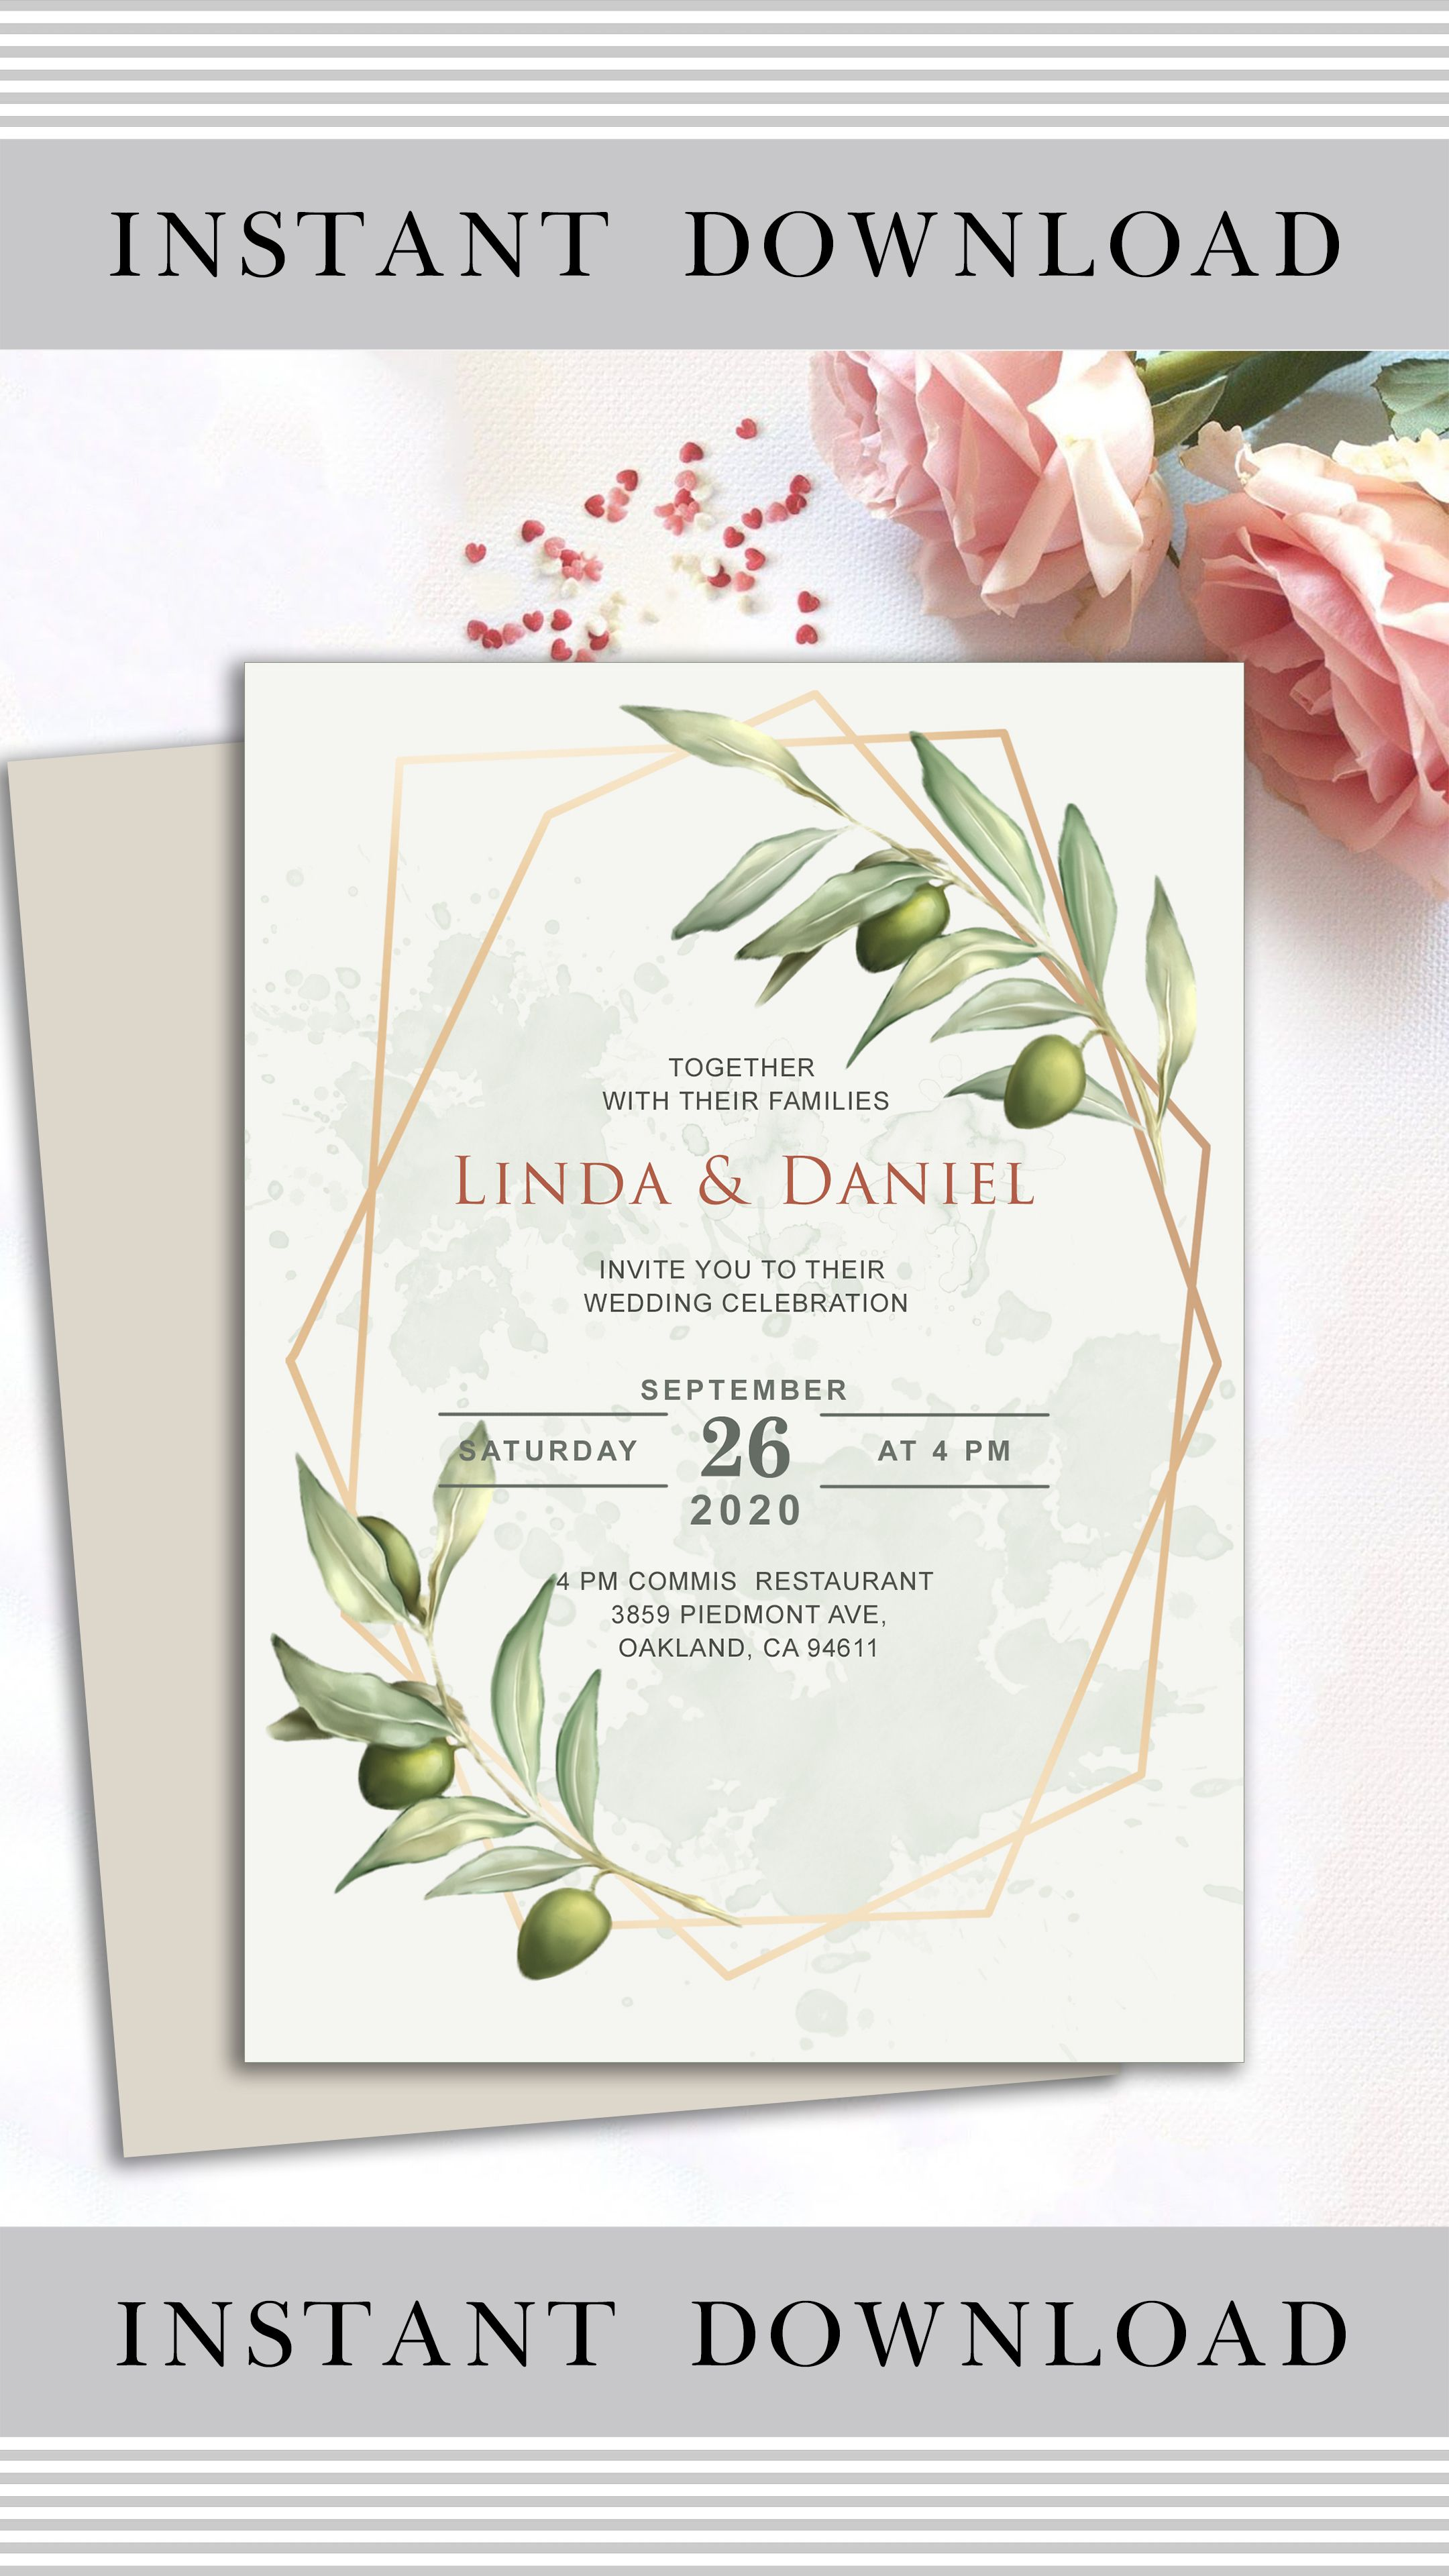 Olive Branch Wedding Invitation Template Olive Botanical Wedding Invitation Geometric Invite Boho Wedding Instant Download Kartu Undangan Pernikahan Contoh Undangan Pernikahan Undangan Pernikahan Gratis